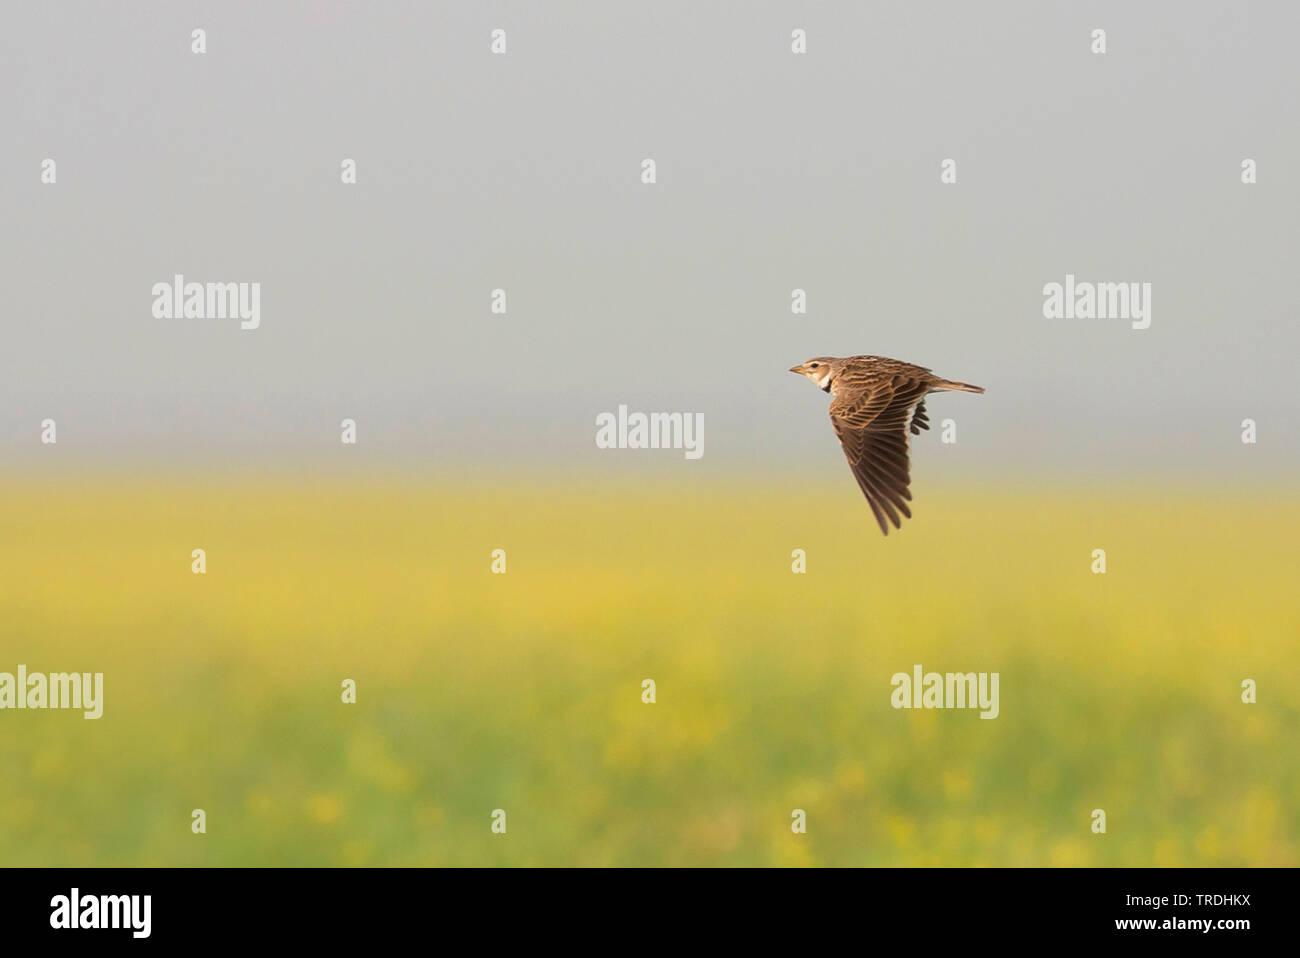 Syrien-Kalanderlerche, Syrien-Kalander-Lerche, Syrienkalanderlerche (Melanocorypha calandra hebraica, Melanocorypha hebraica), Altvogel im Flug, Tuerk - Stock Image